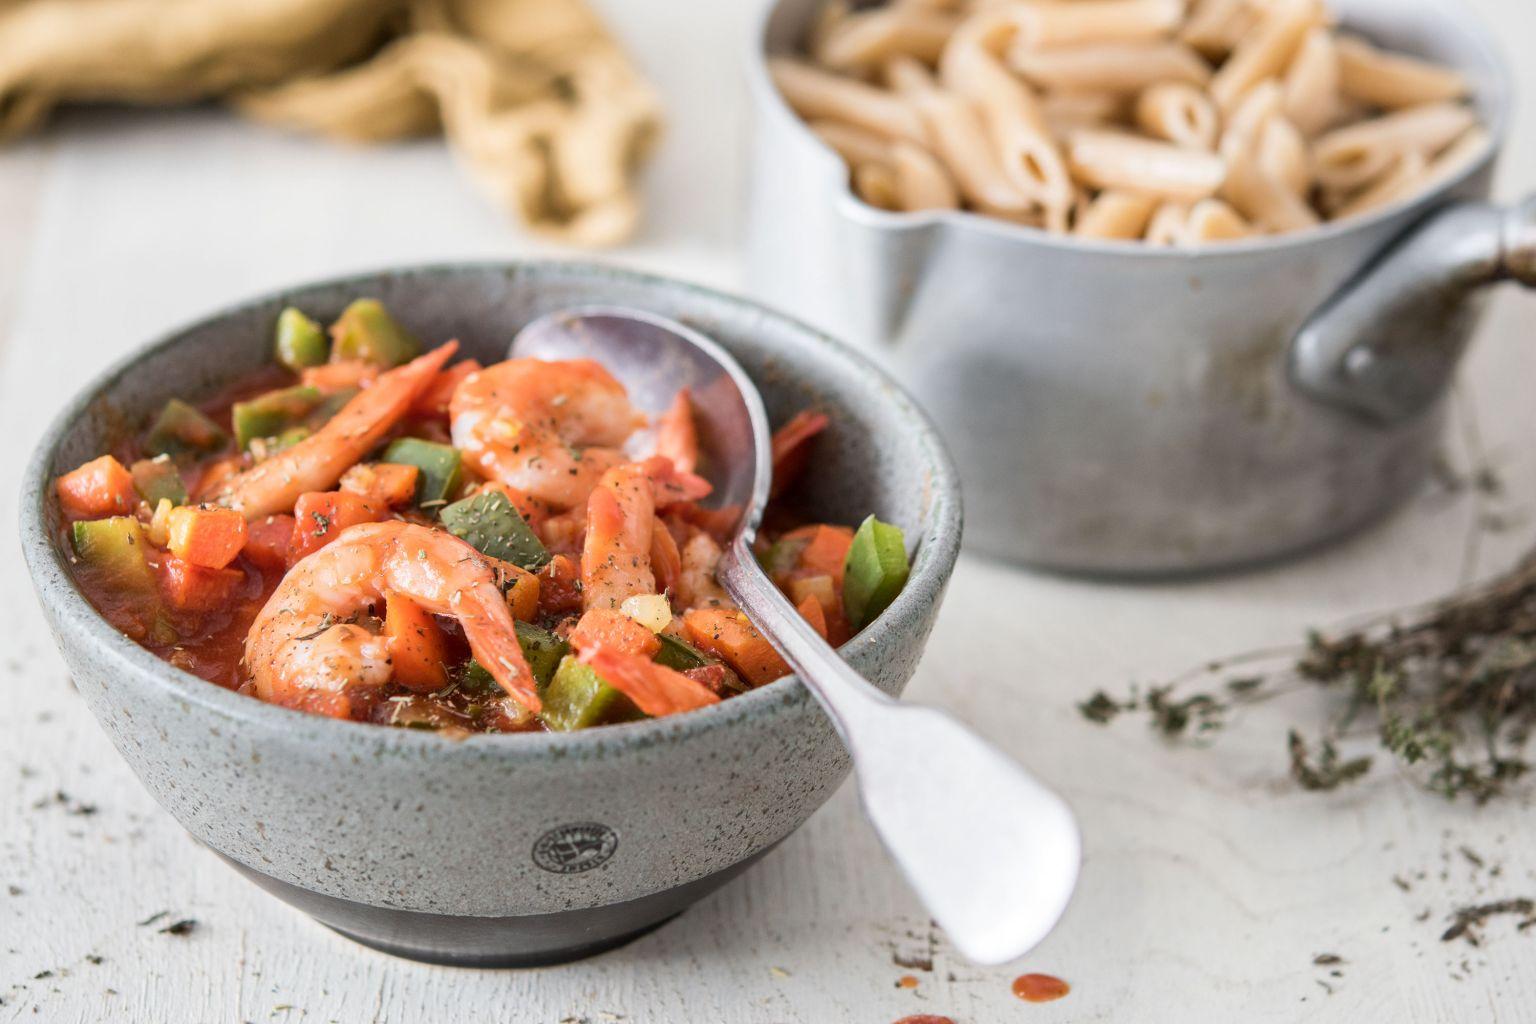 Spaghetti aux crevettes et à la sauce marinara (20 min)